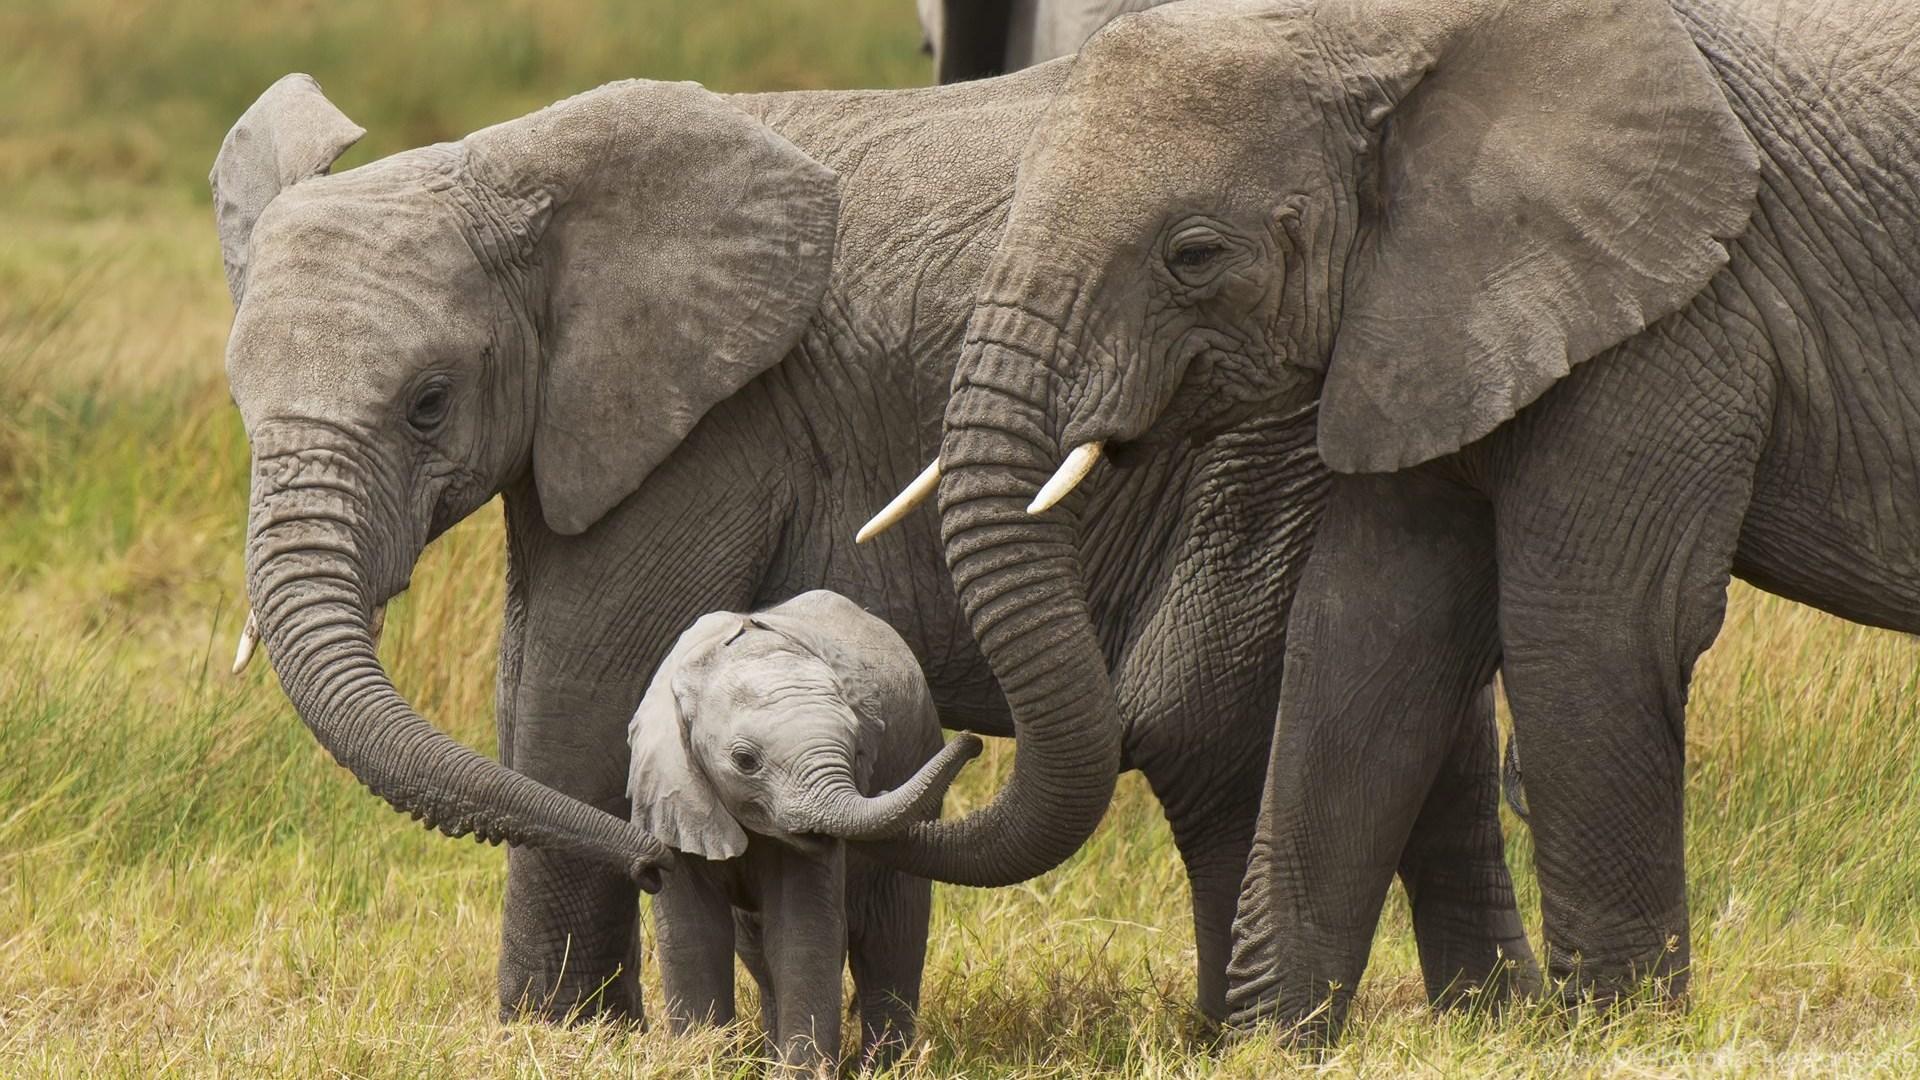 Elephants With Cute Little Baby Elephant HD Wallpapers ...